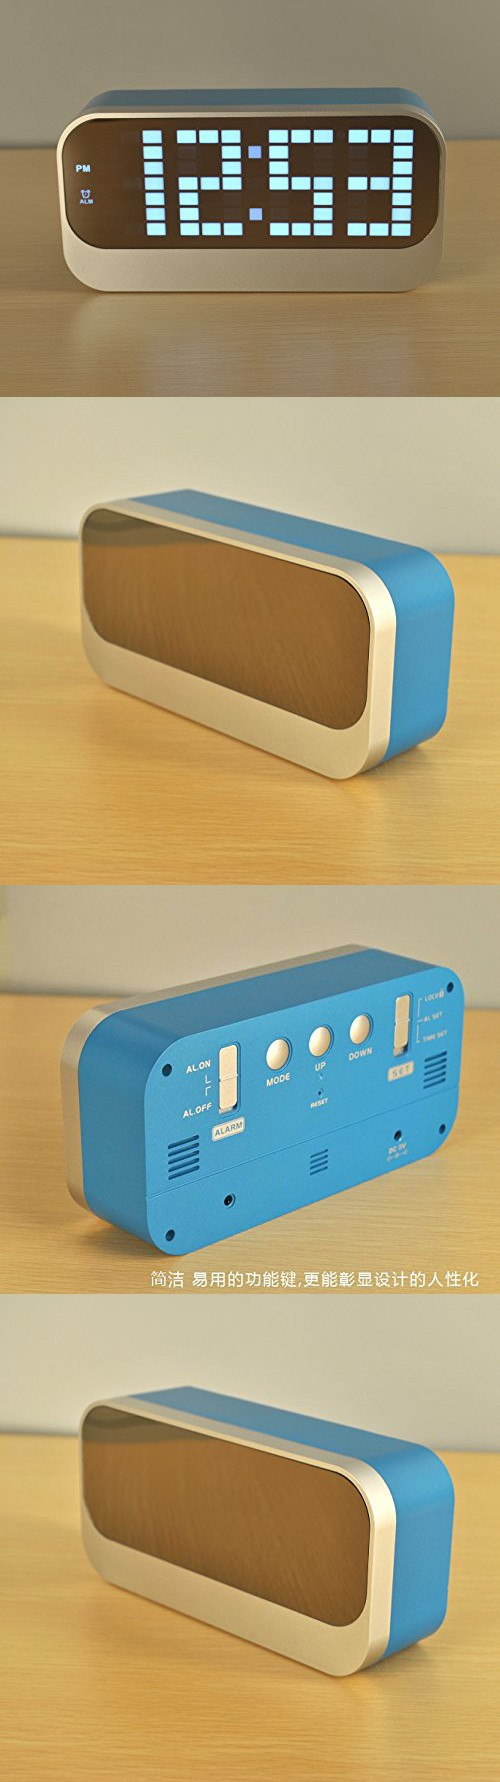 Alarm Clock,Bigaint Creative LED Digital Electric Alarm Clock with Luminous,Backlight,Temperature Function-Blue